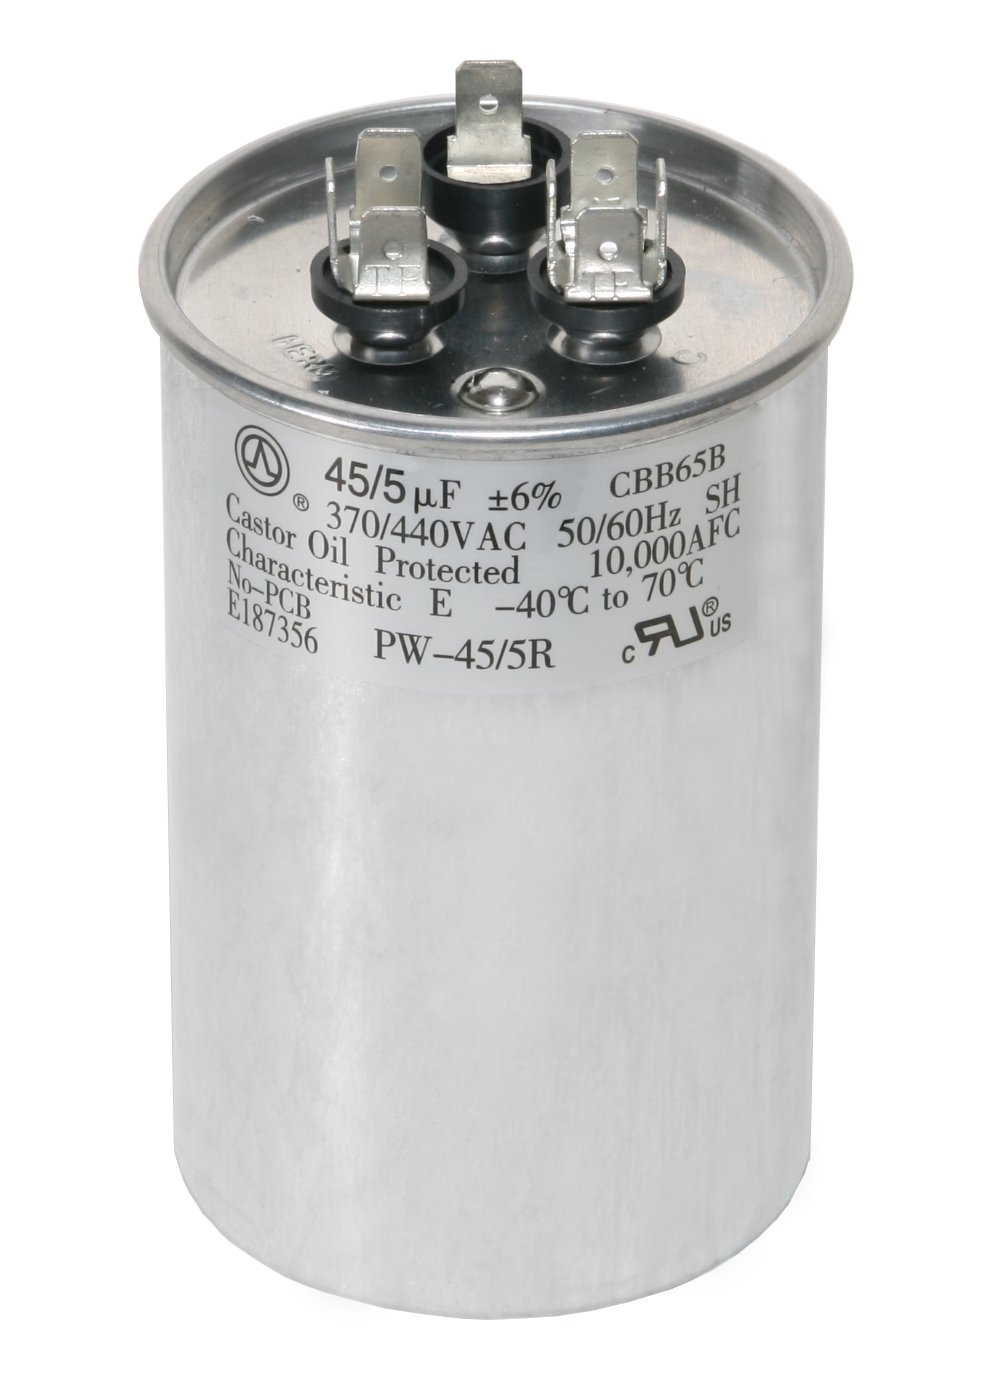 Round Dual Capacitor Wiring Best Secret Diagram Microwave Capaister For Ac Amazon Com Rh Air Compressor Spod Diaram Ladder